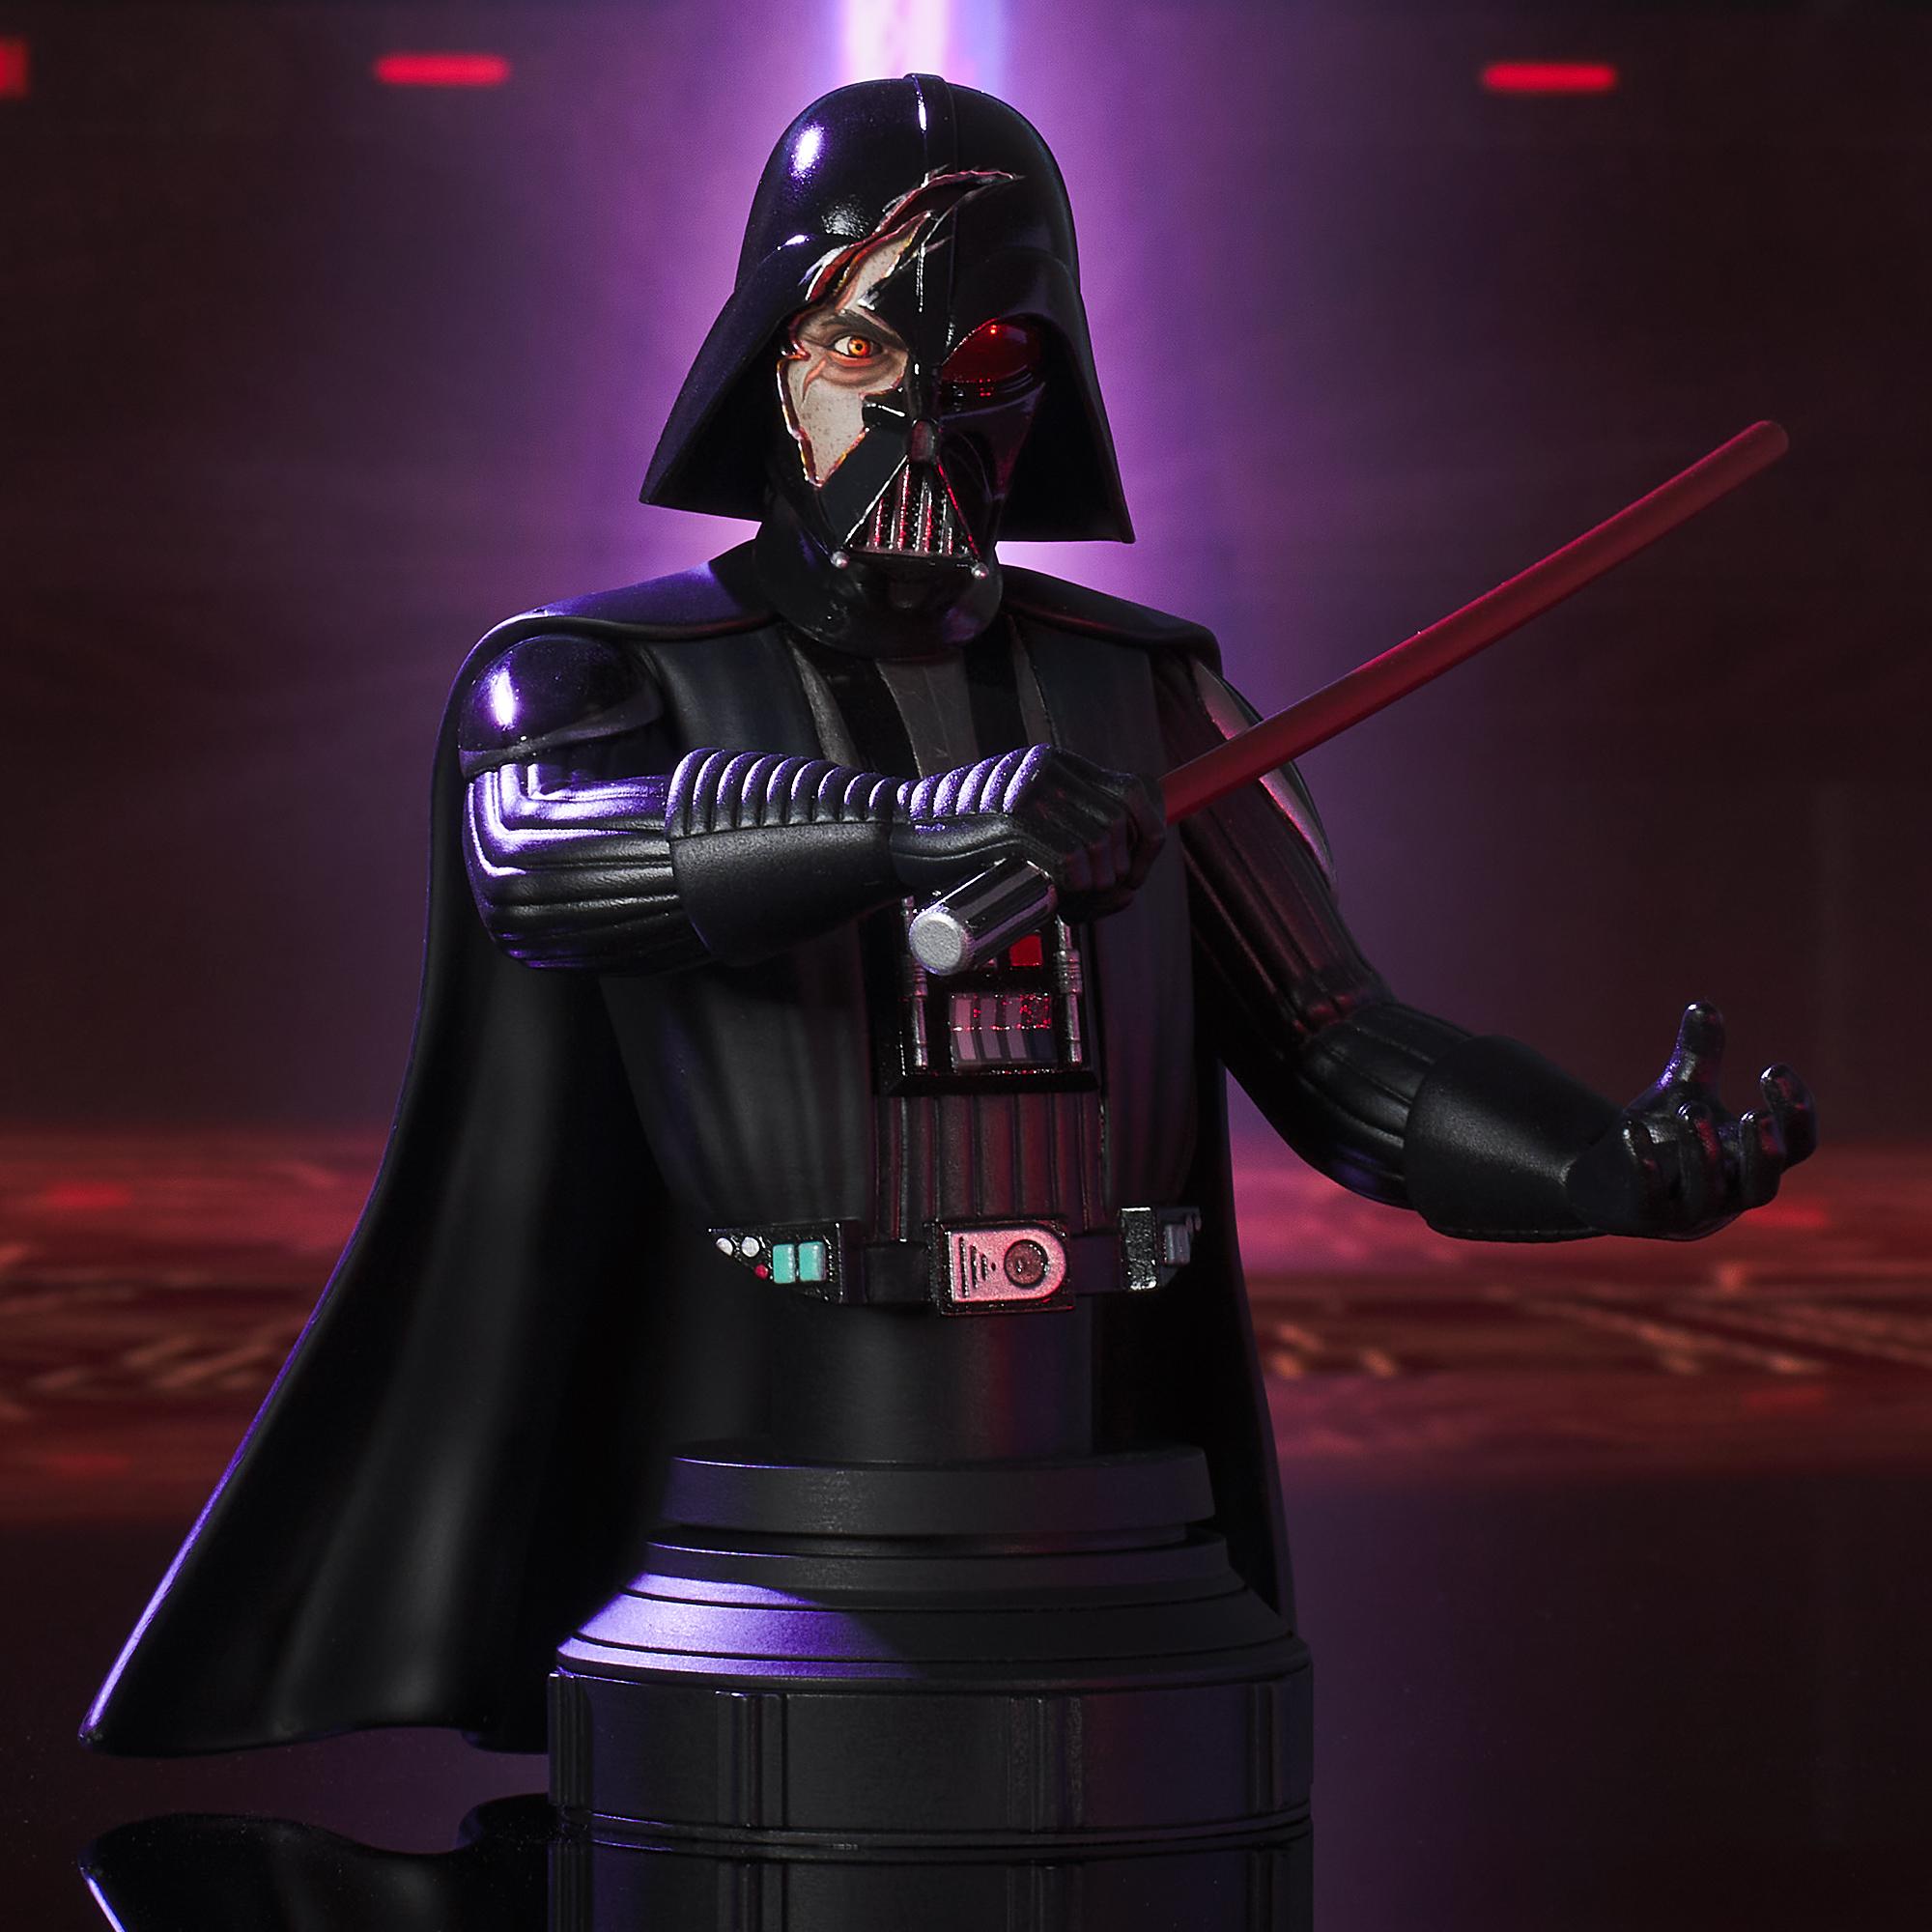 Star Wars: Rebels™ - Darth Vader™ Deluxe Mini Bust